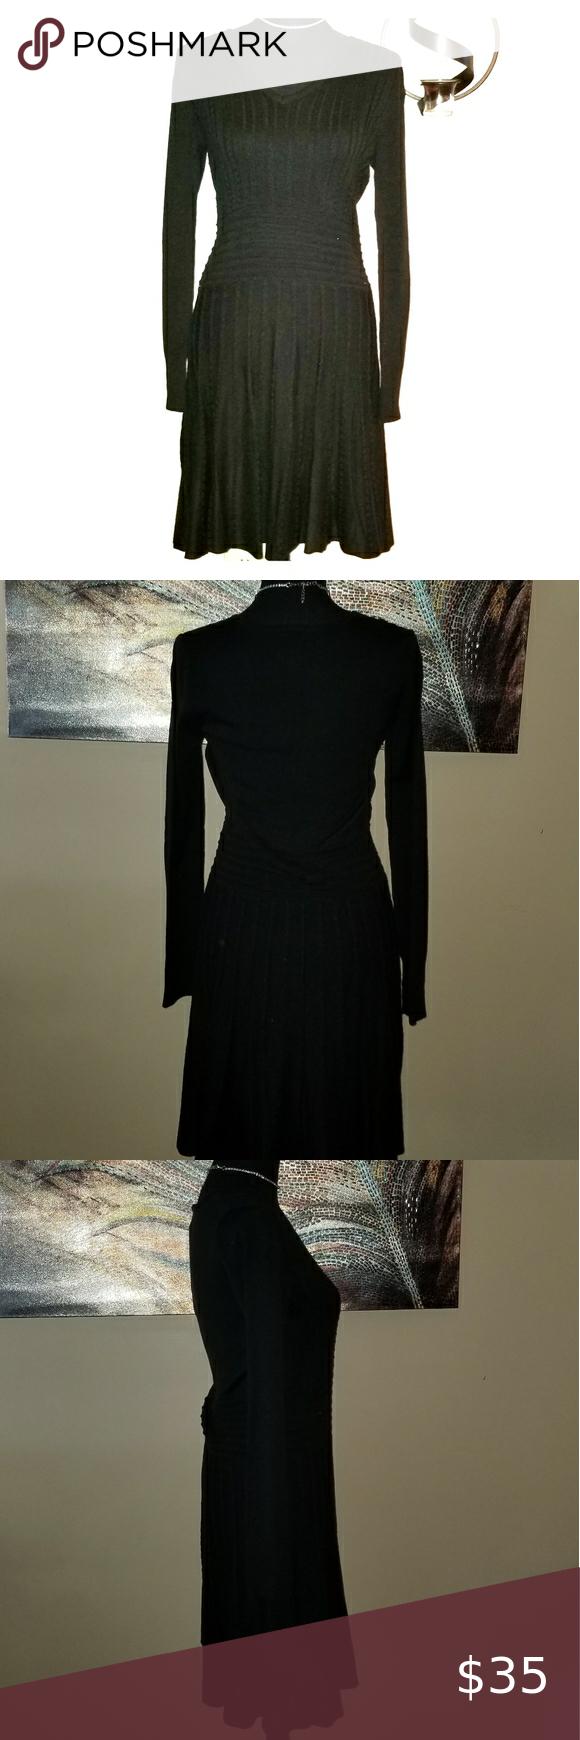 Vince Camuto Black Swaeter Dress Dresses Colorful Dresses Sweater Dress [ 1740 x 580 Pixel ]